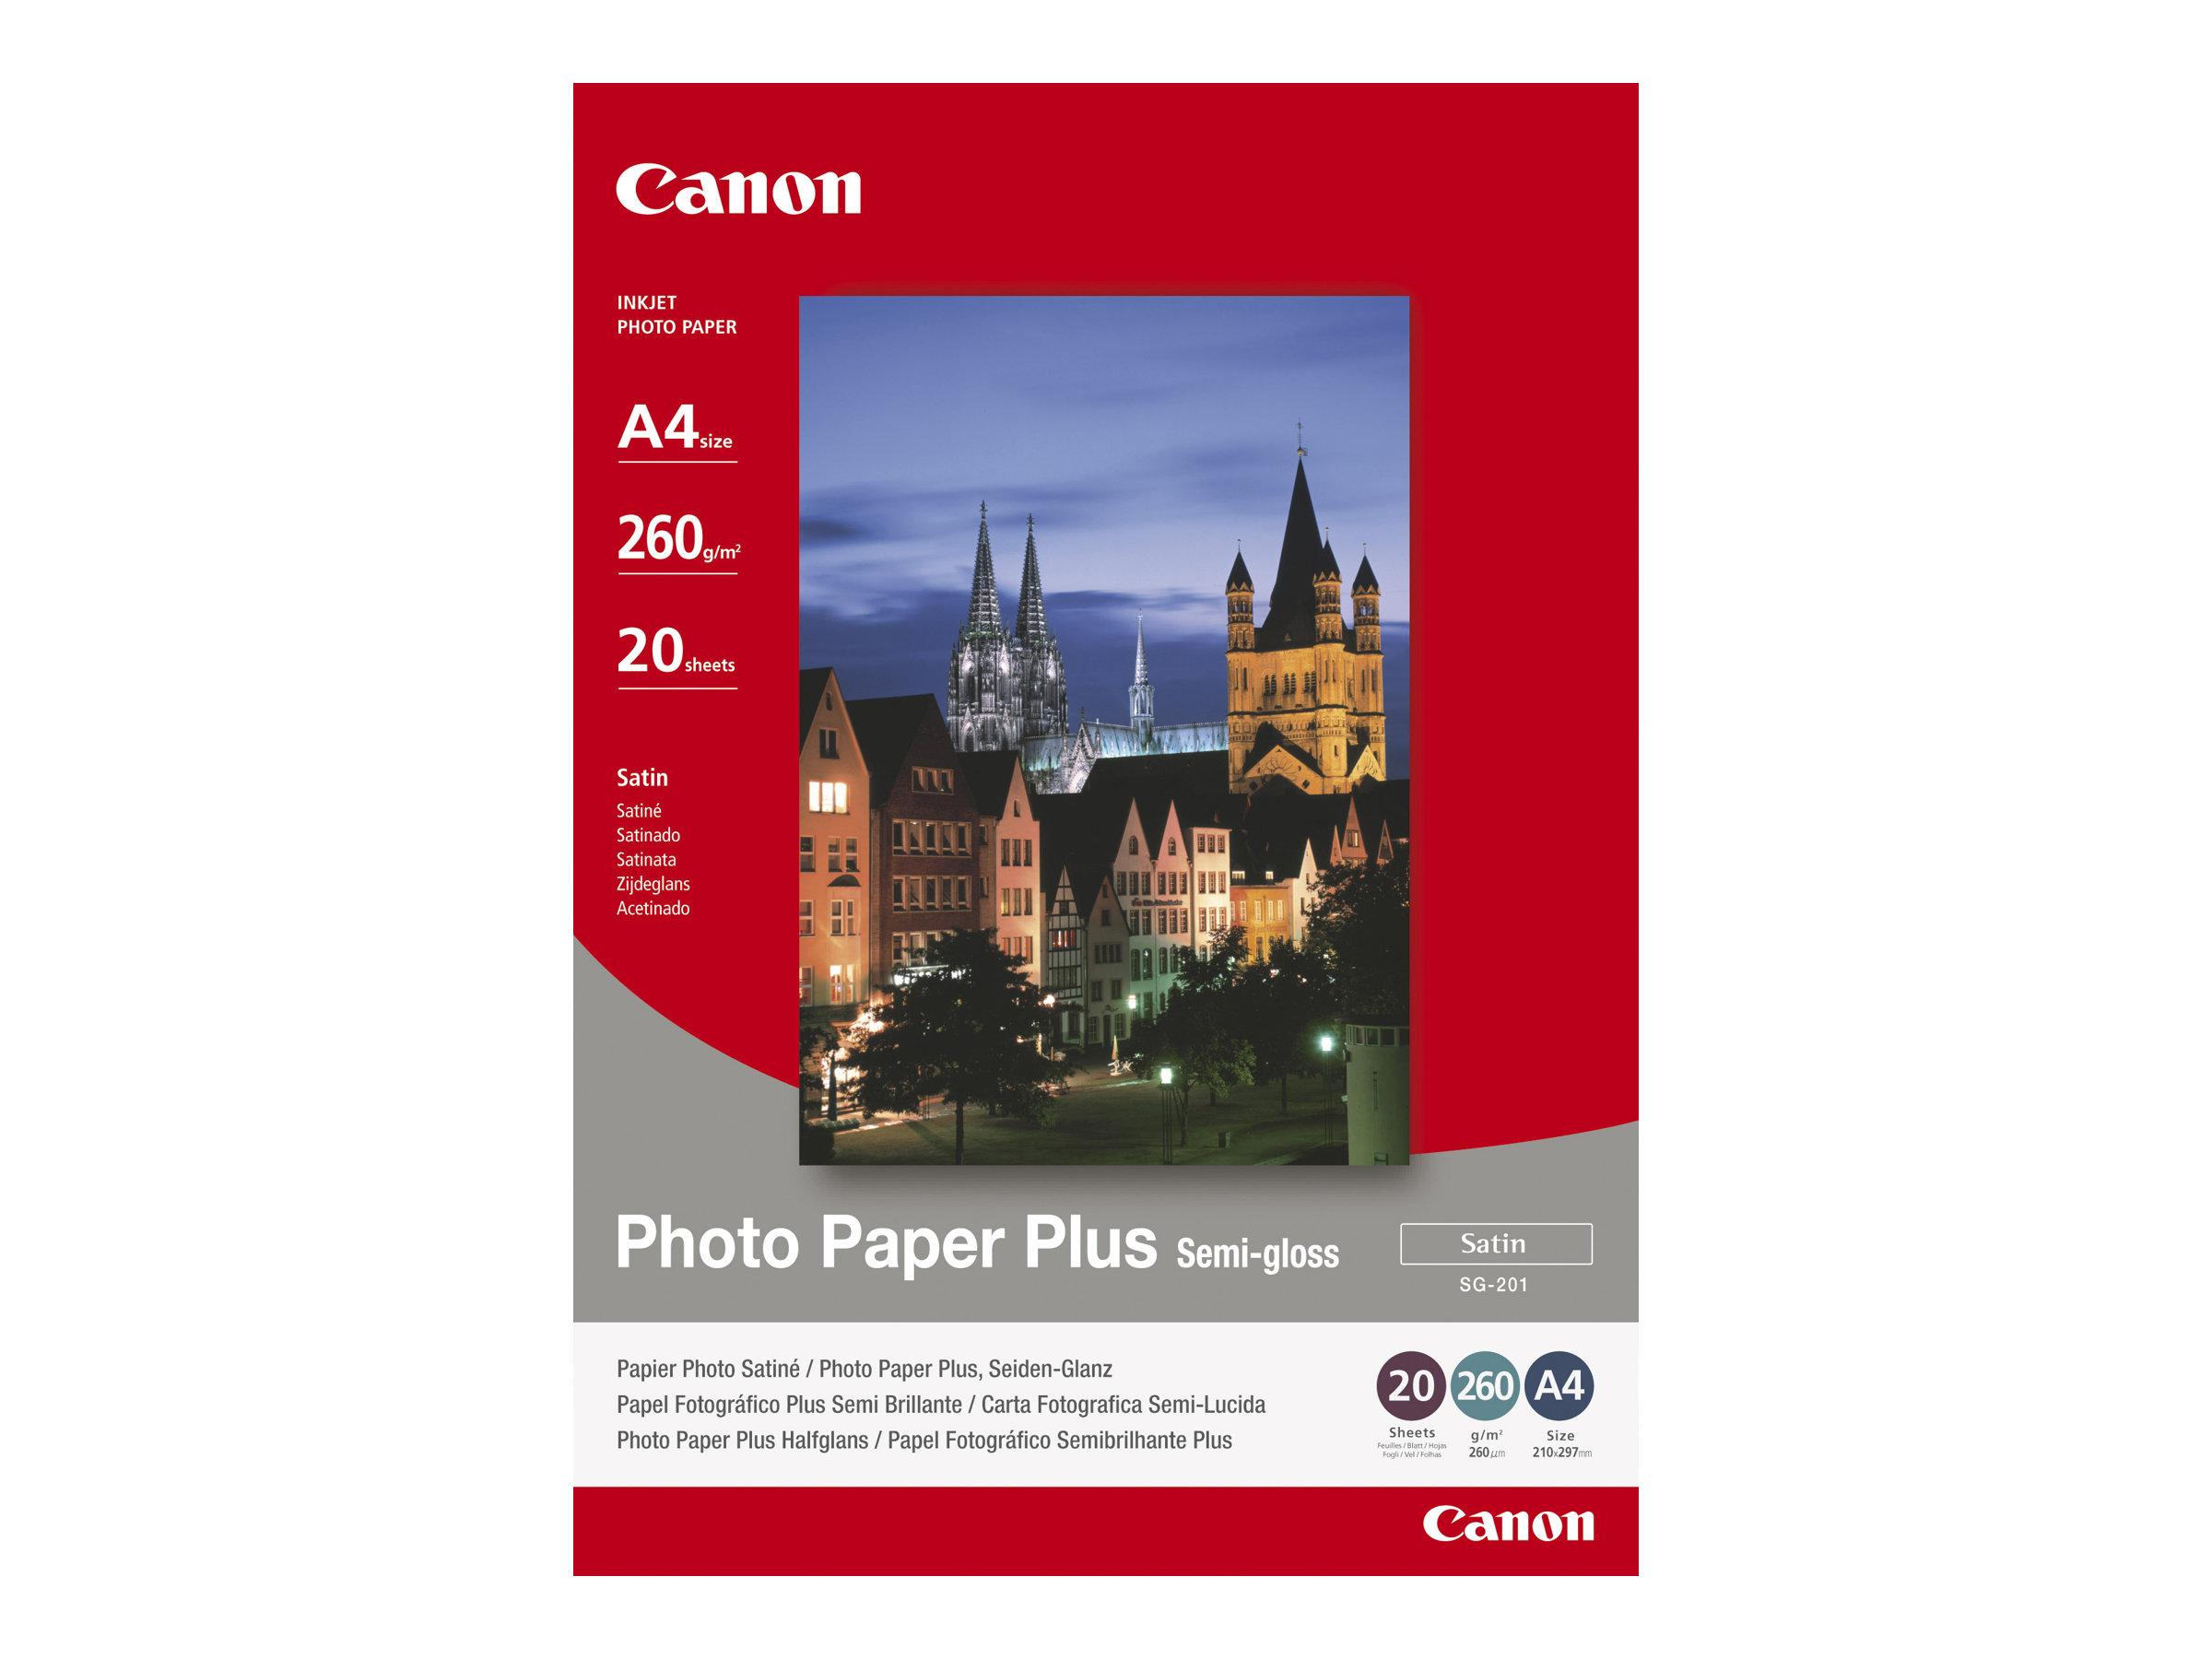 Canon Photo Paper Plus SG-201 - Halbglänzend - 203 x 254 mm - 260 g/m² - 20 Blatt Fotopapier - für PIXMA iP3300, iP4300, iP5300,